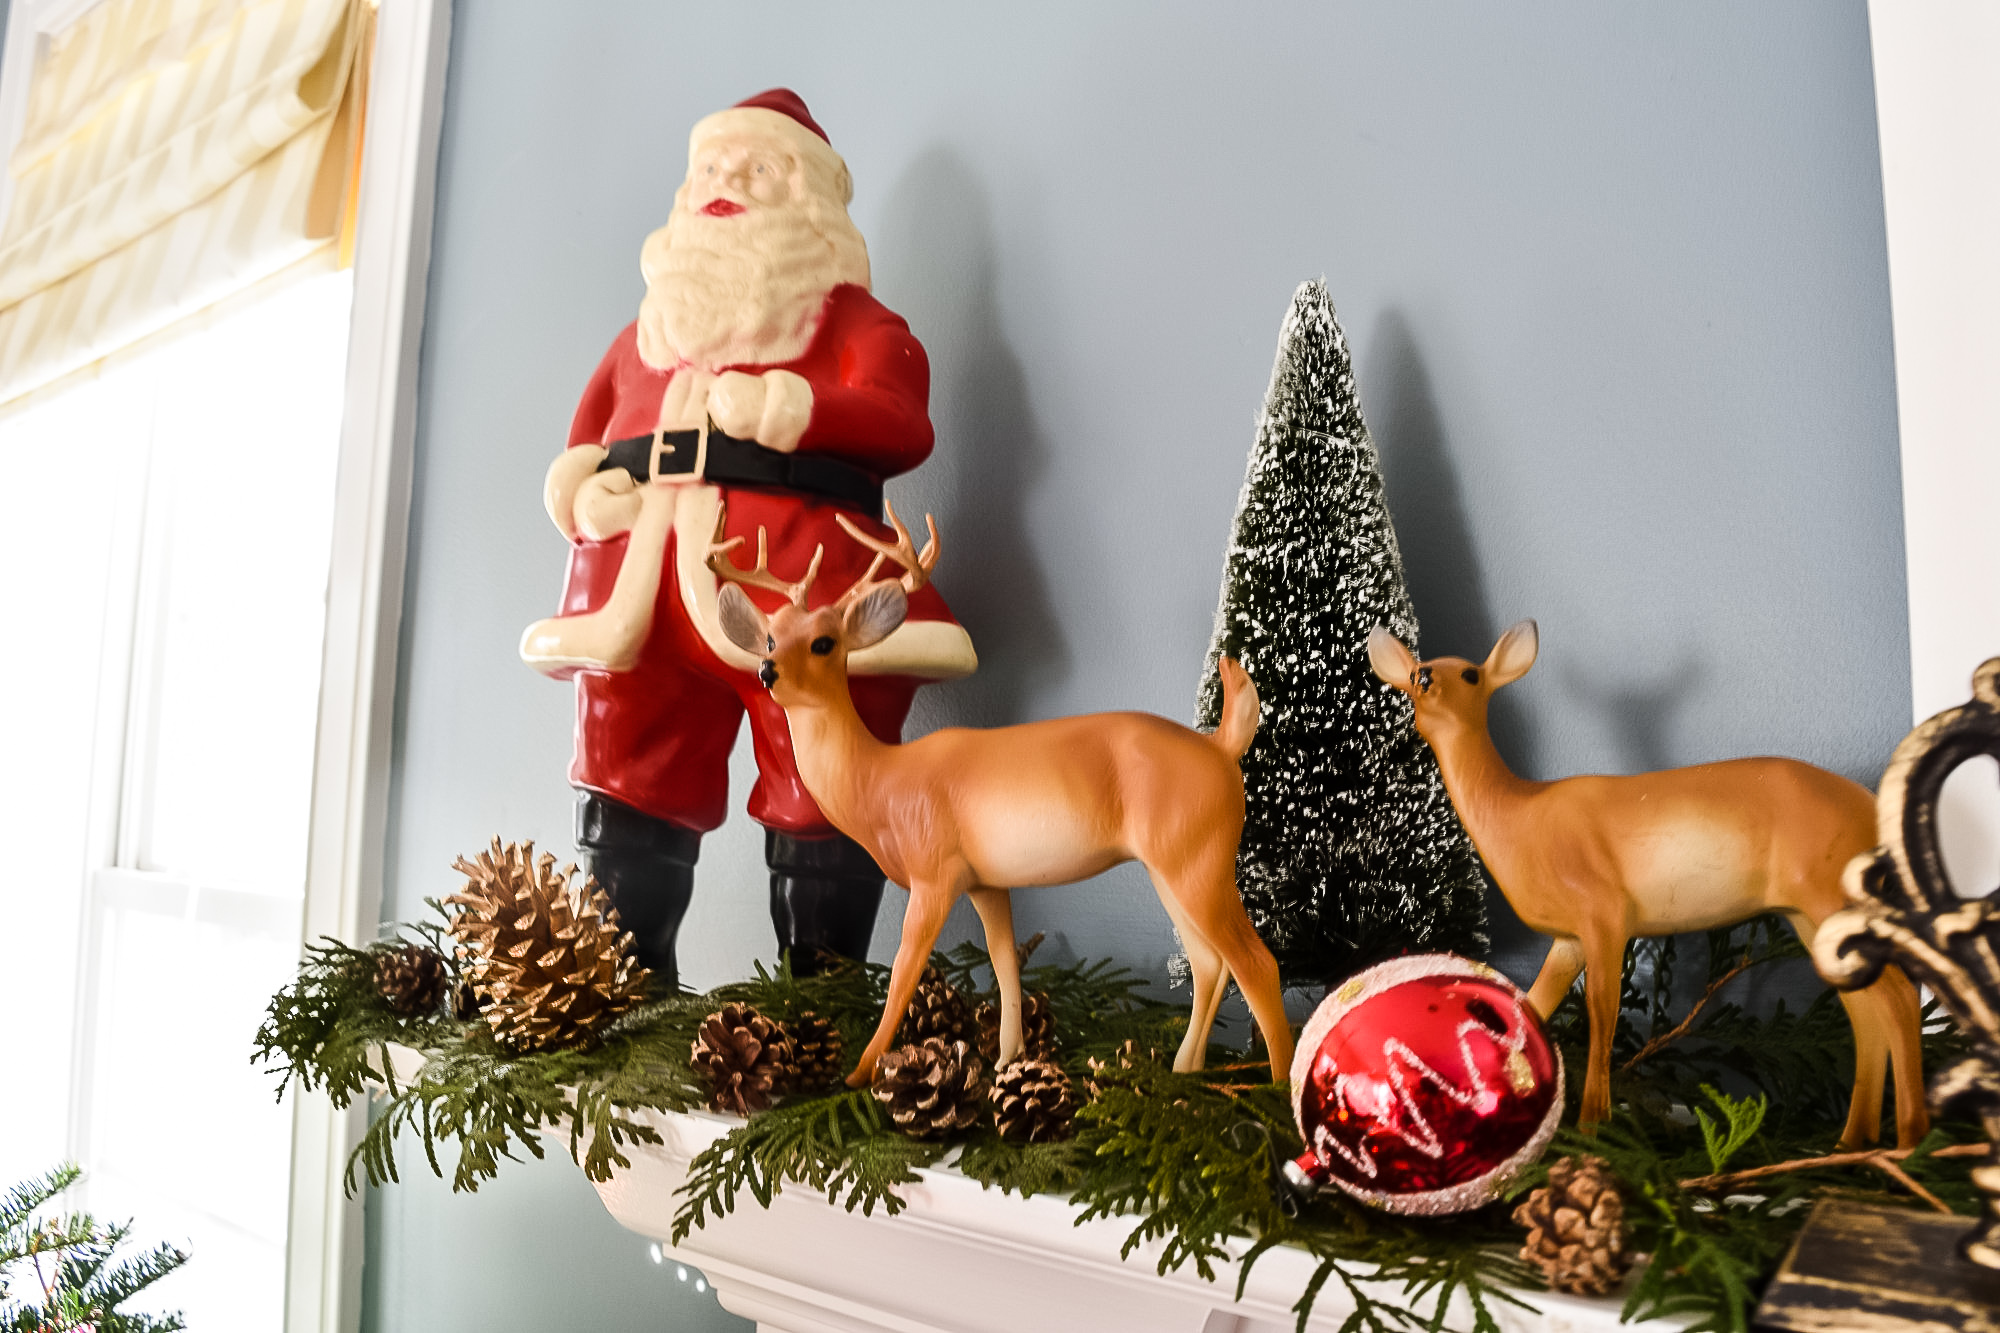 plastic vintage Santa and reindeer on a Christmas mantell